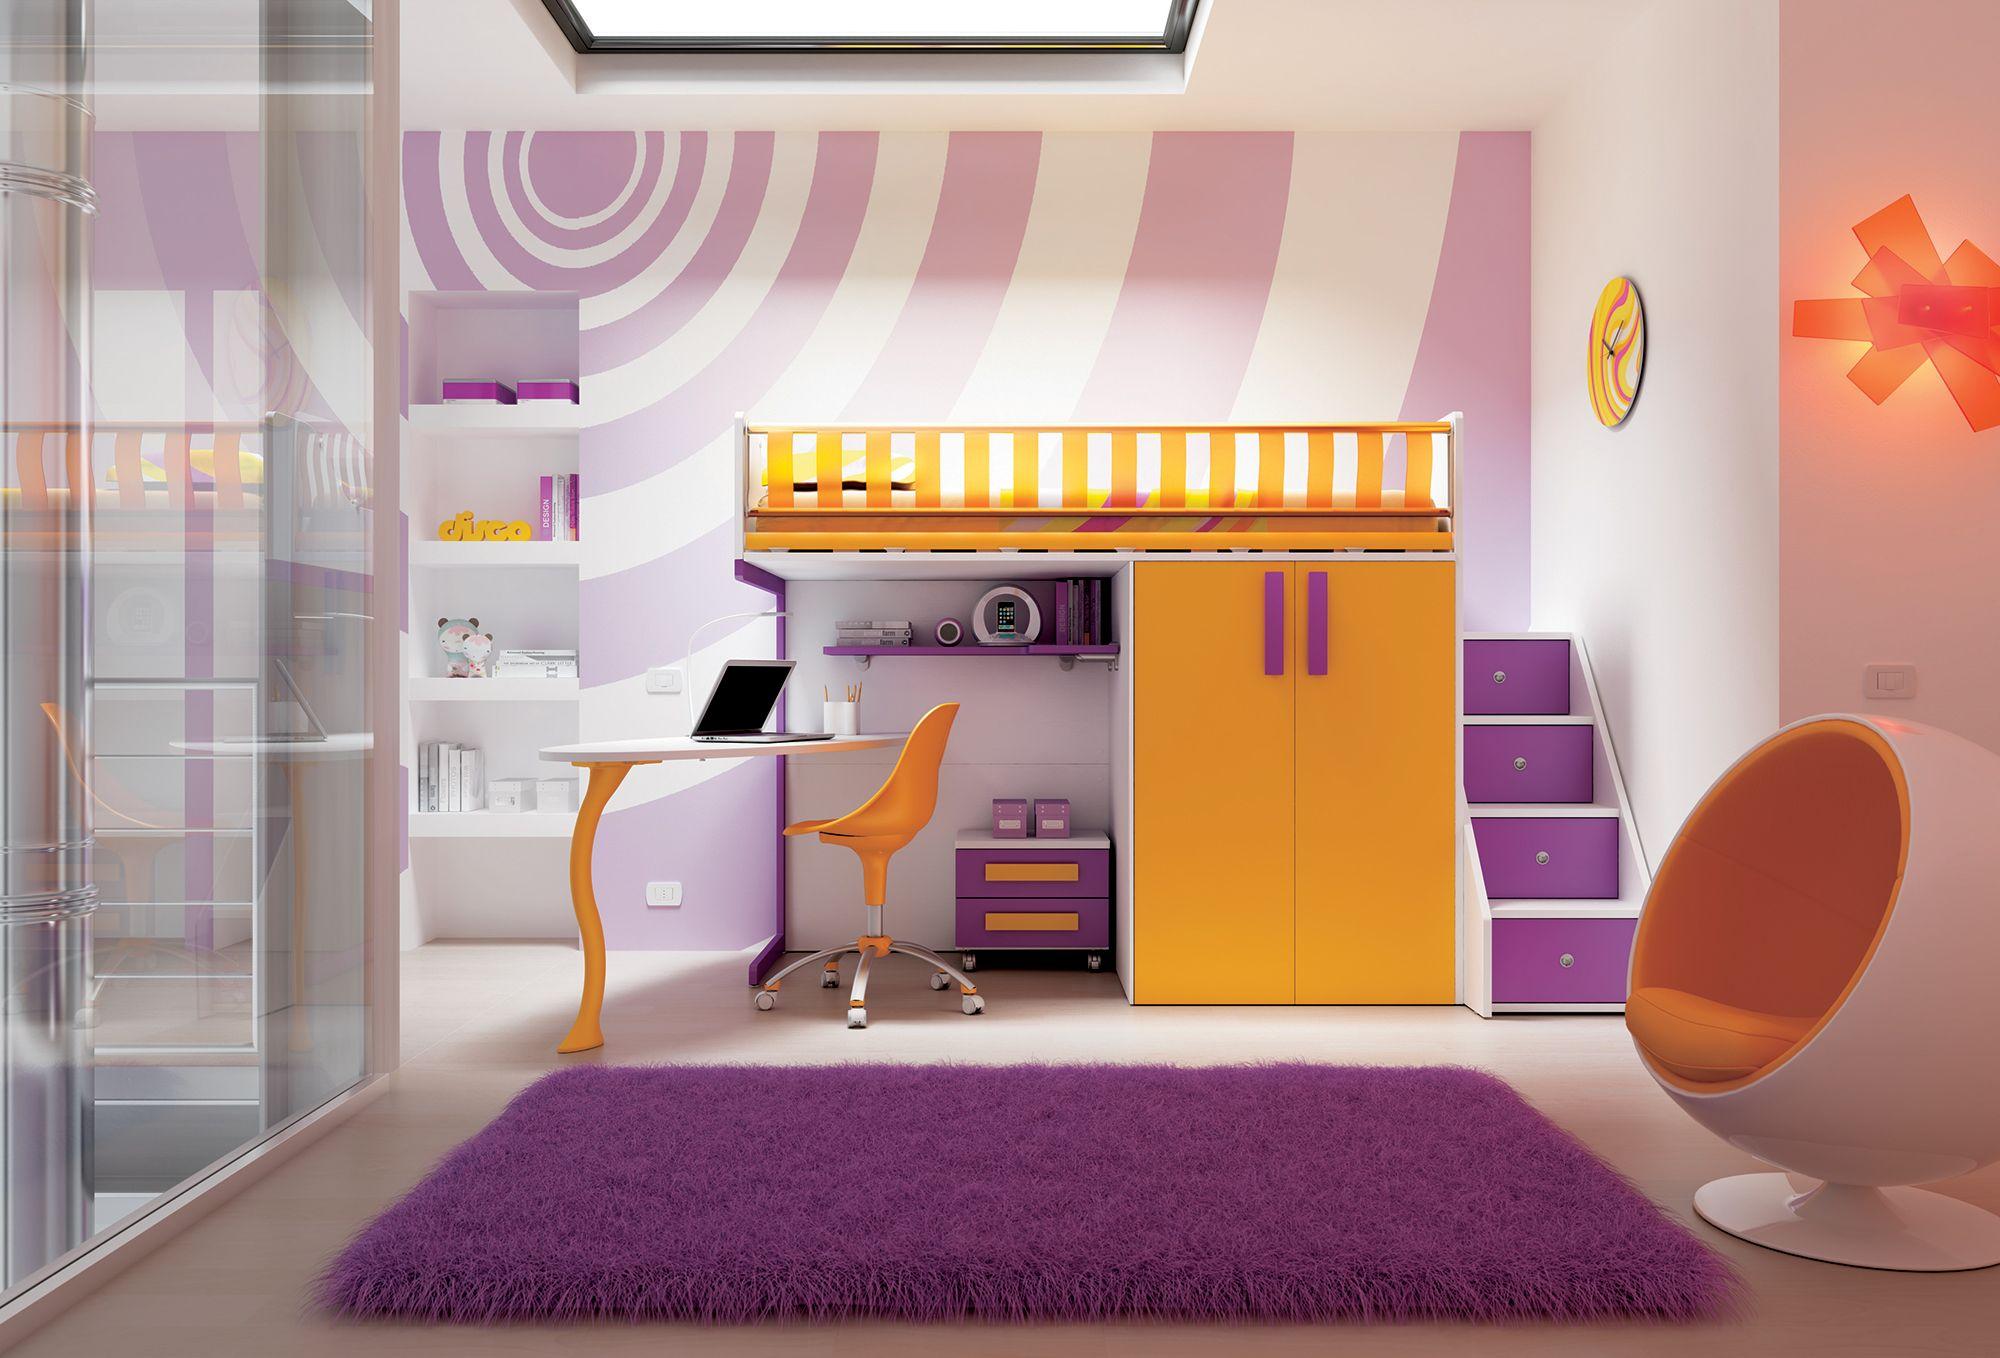 Deco Petite Chambre Enfant image result for deco petite chambre enfant | room, dream